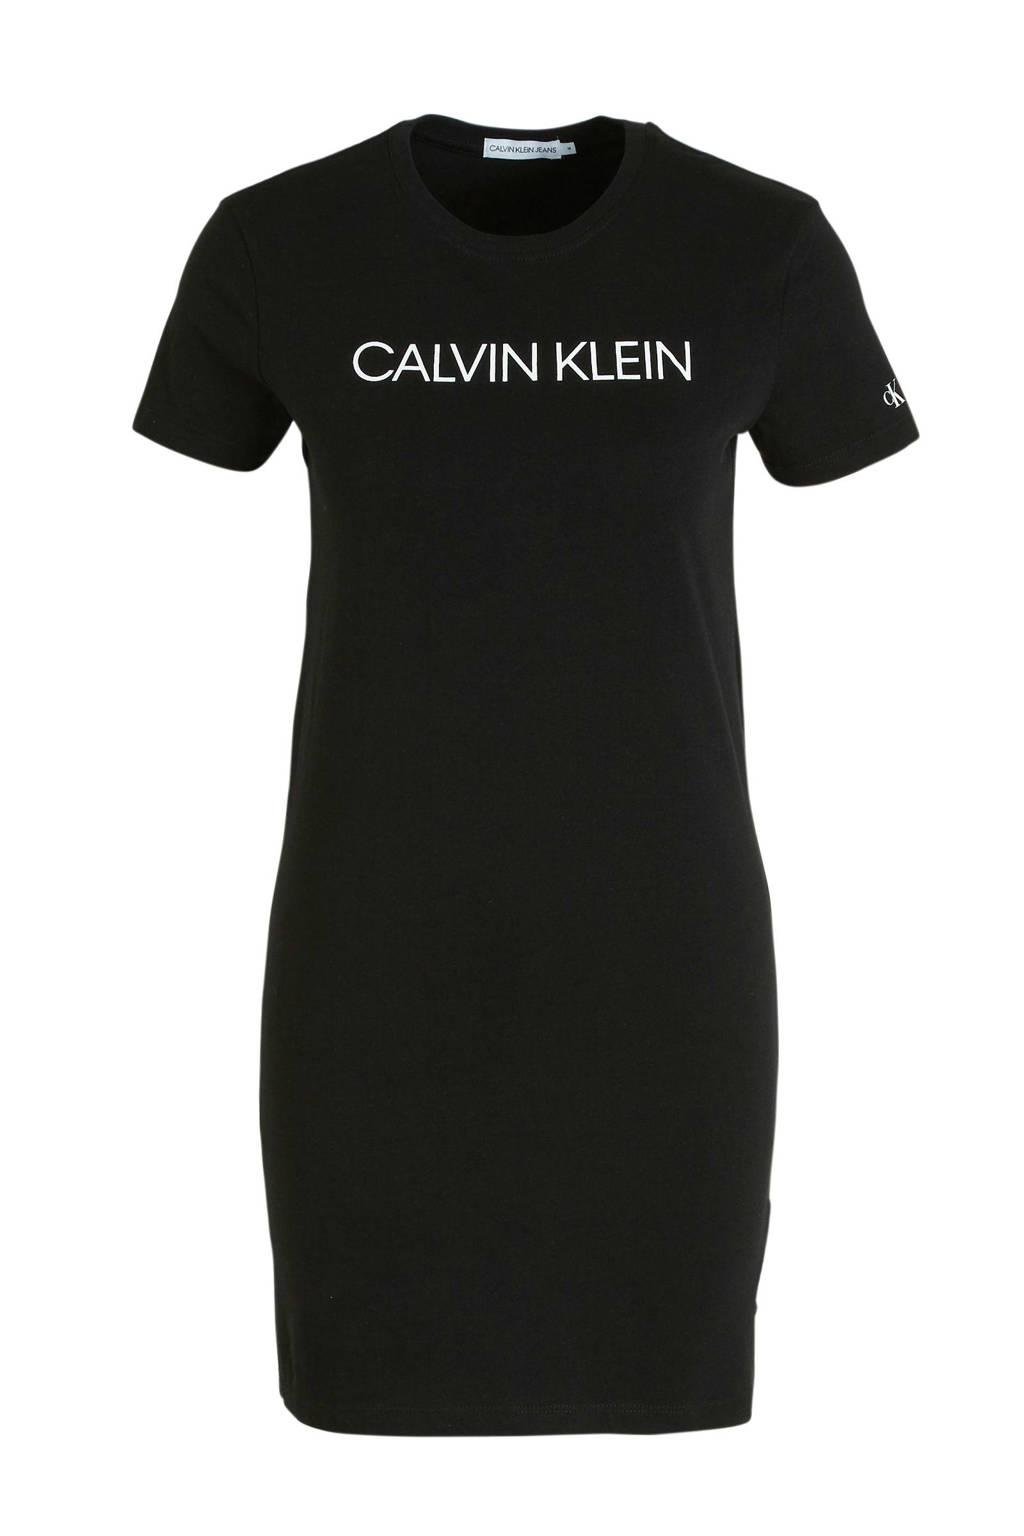 CALVIN KLEIN JEANS T-shirtjurk van biologisch katoen zwart/wit, Zwart/wit